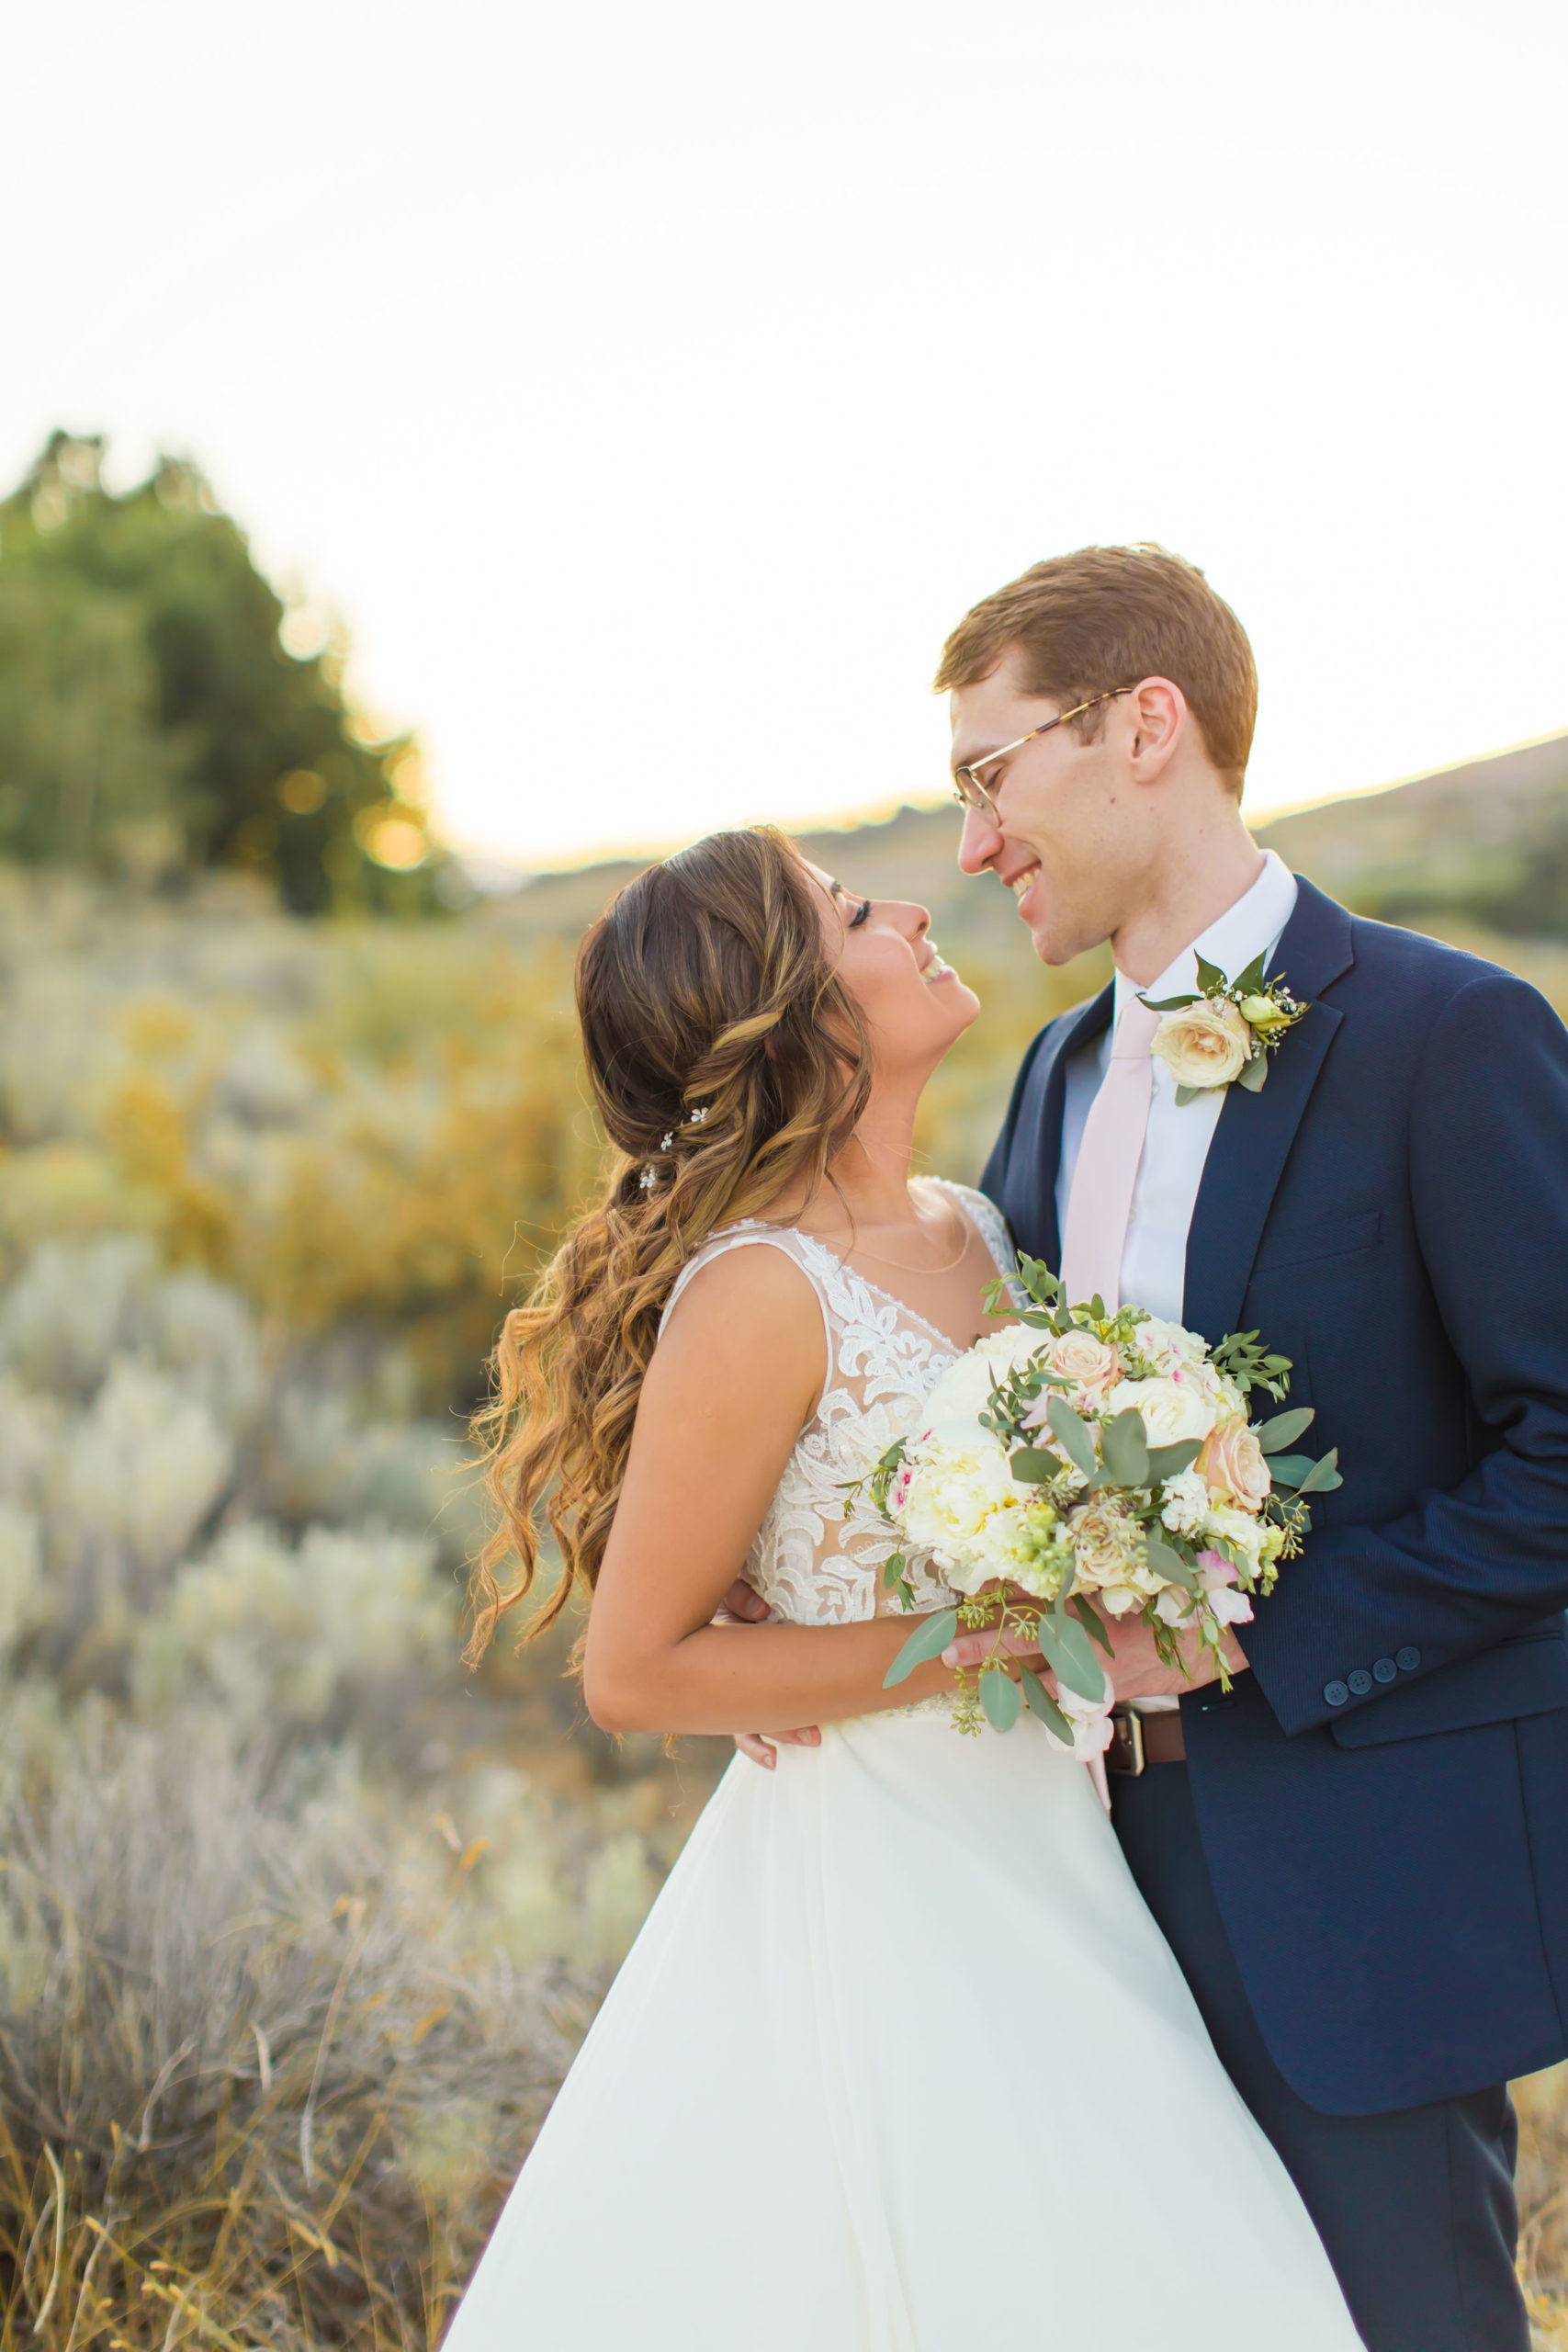 Jessica and Doug as Newlywed